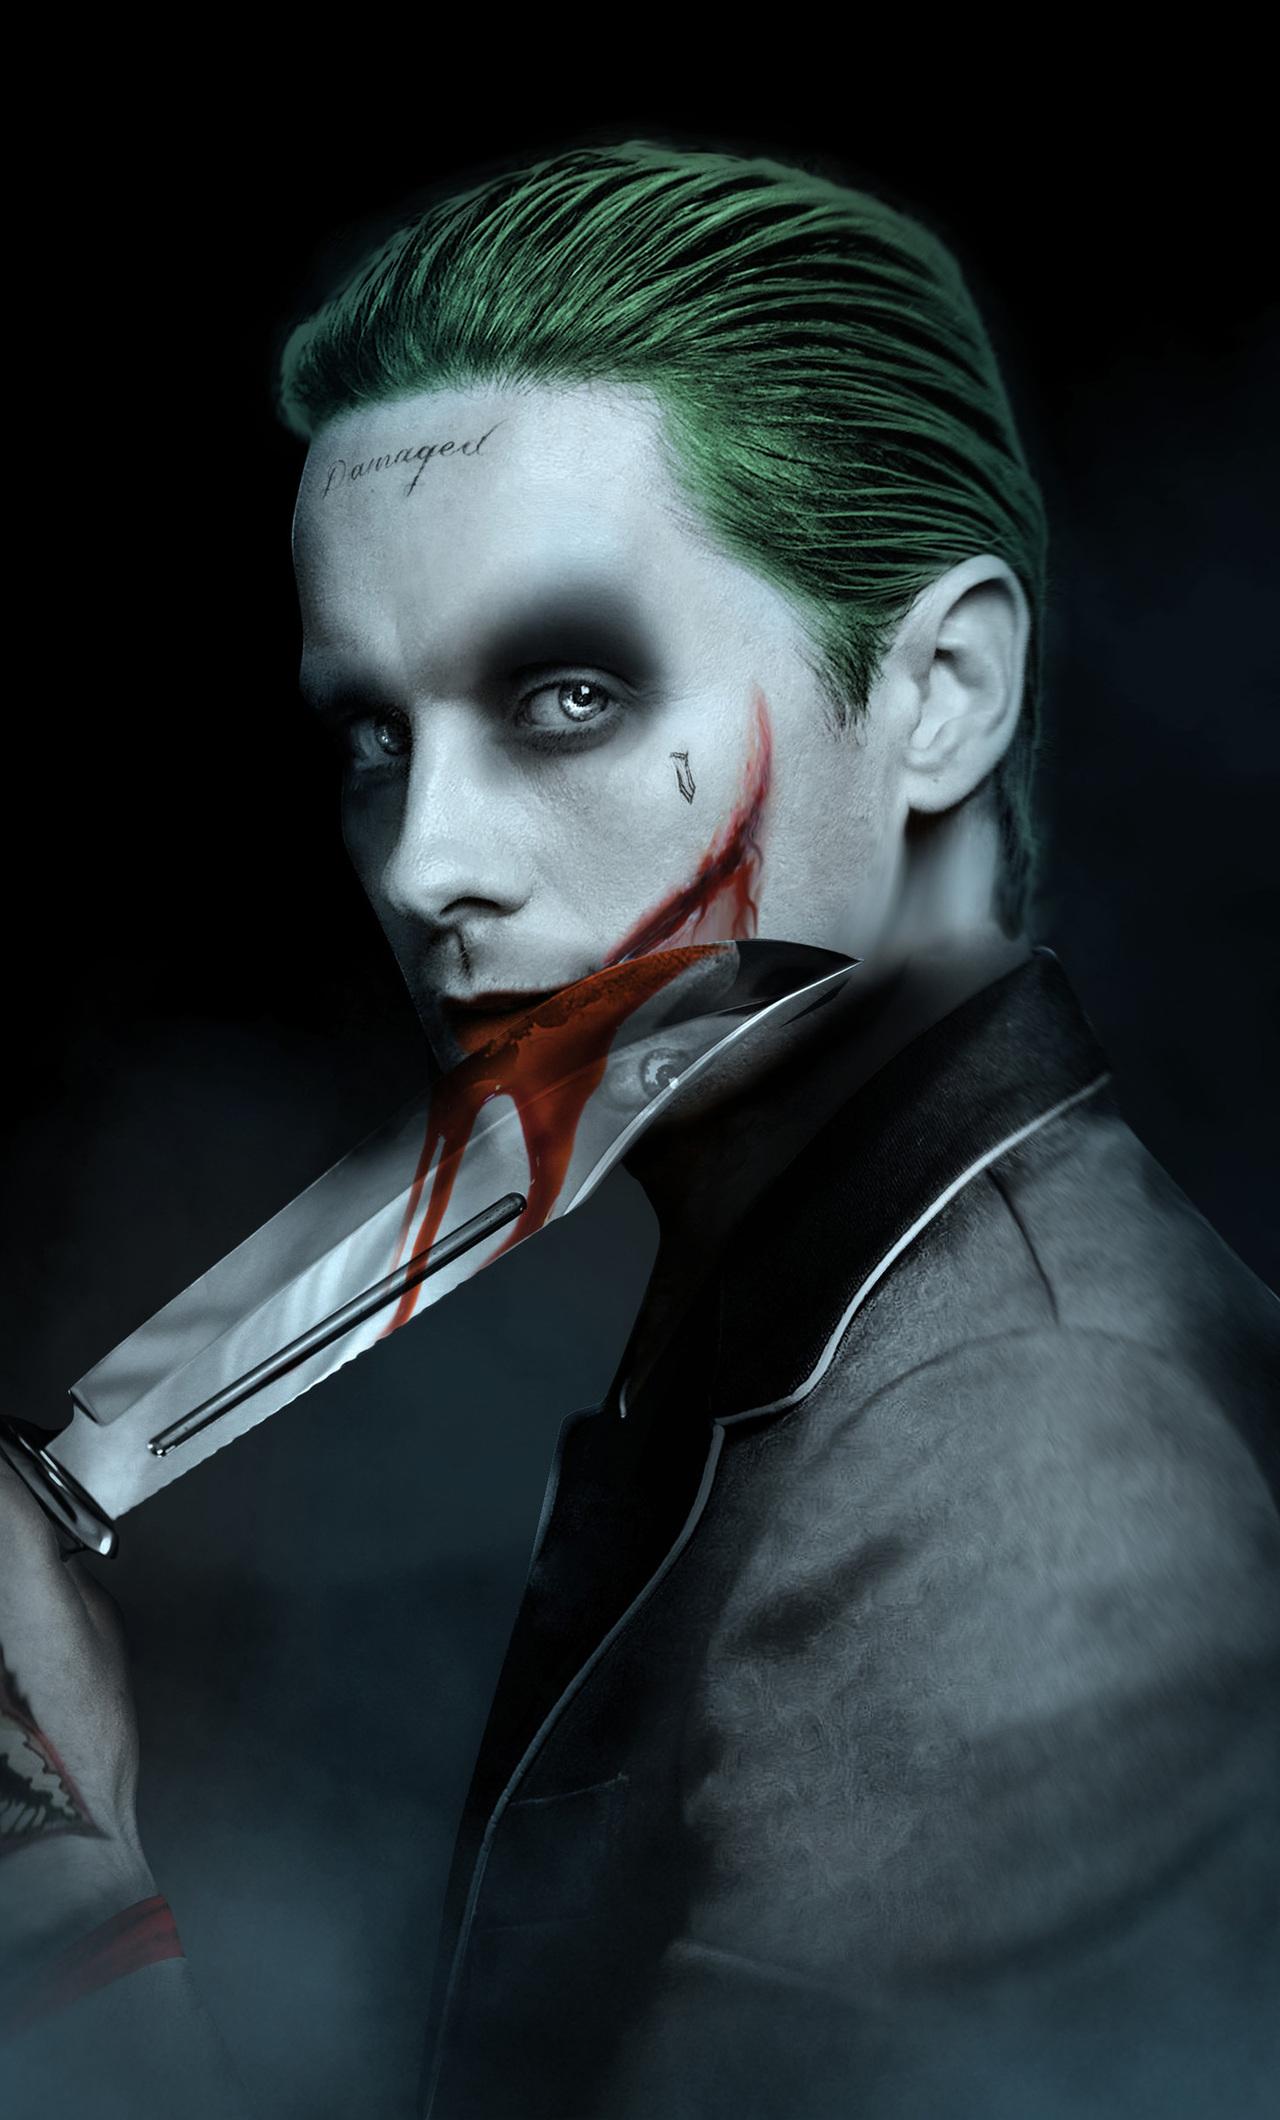 1280x2120 Jared Leto Joker Artwork iPhone 6+ HD 4k ...